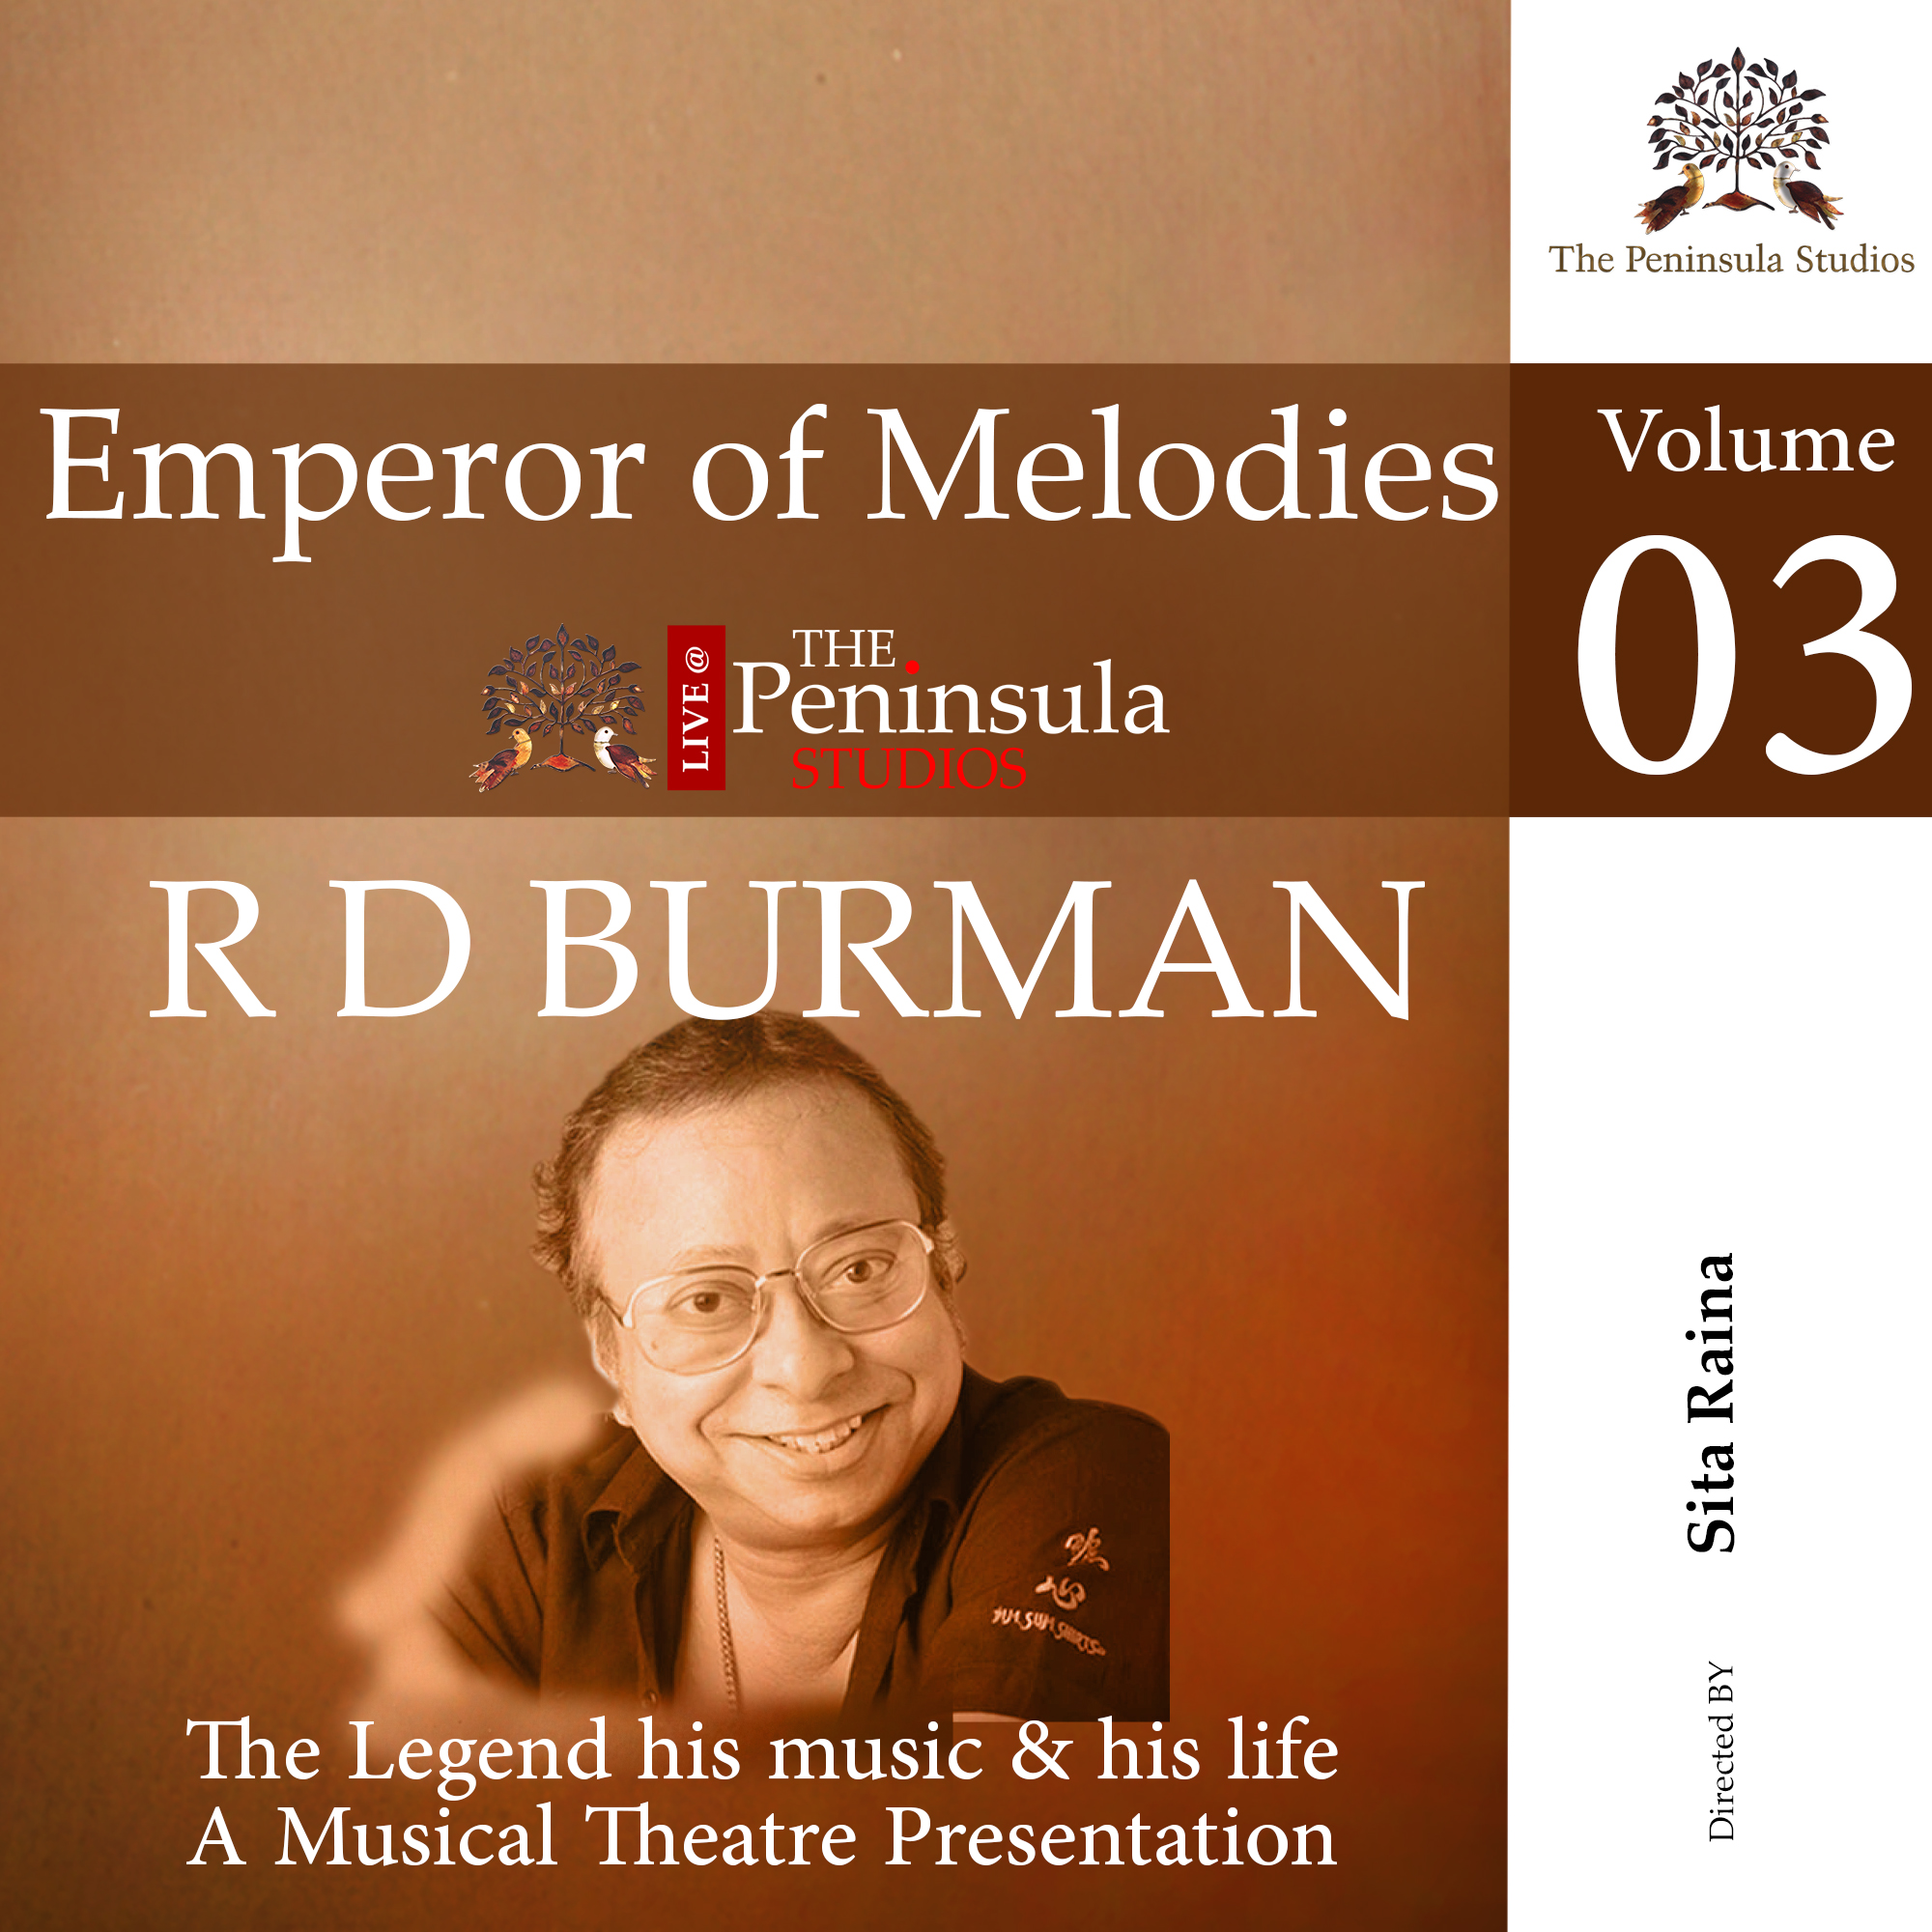 eom R D Burman